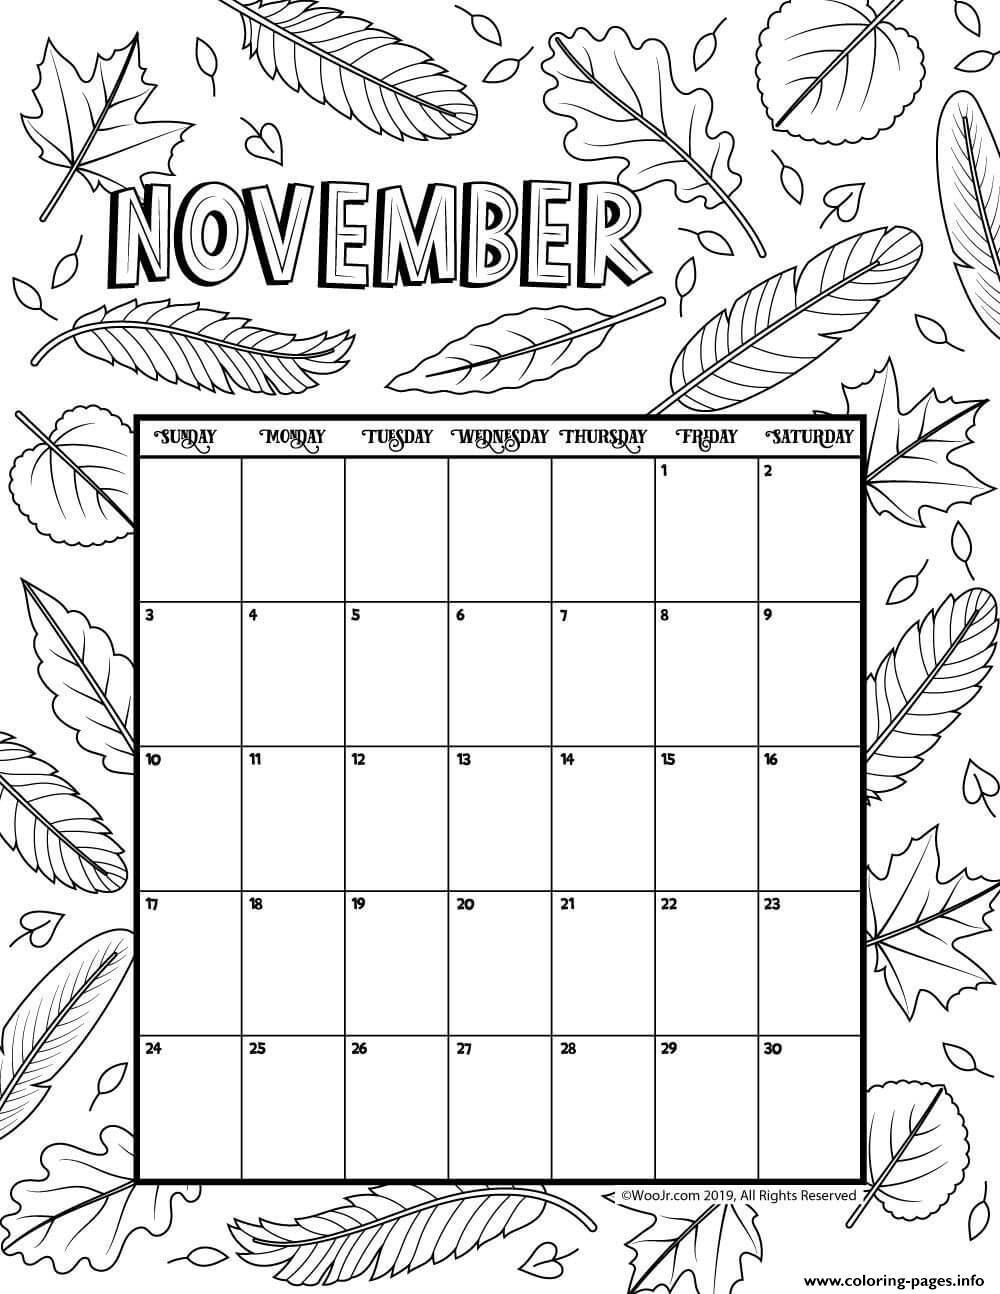 November Coloring Calendar 2019 Coloring Pages Printable